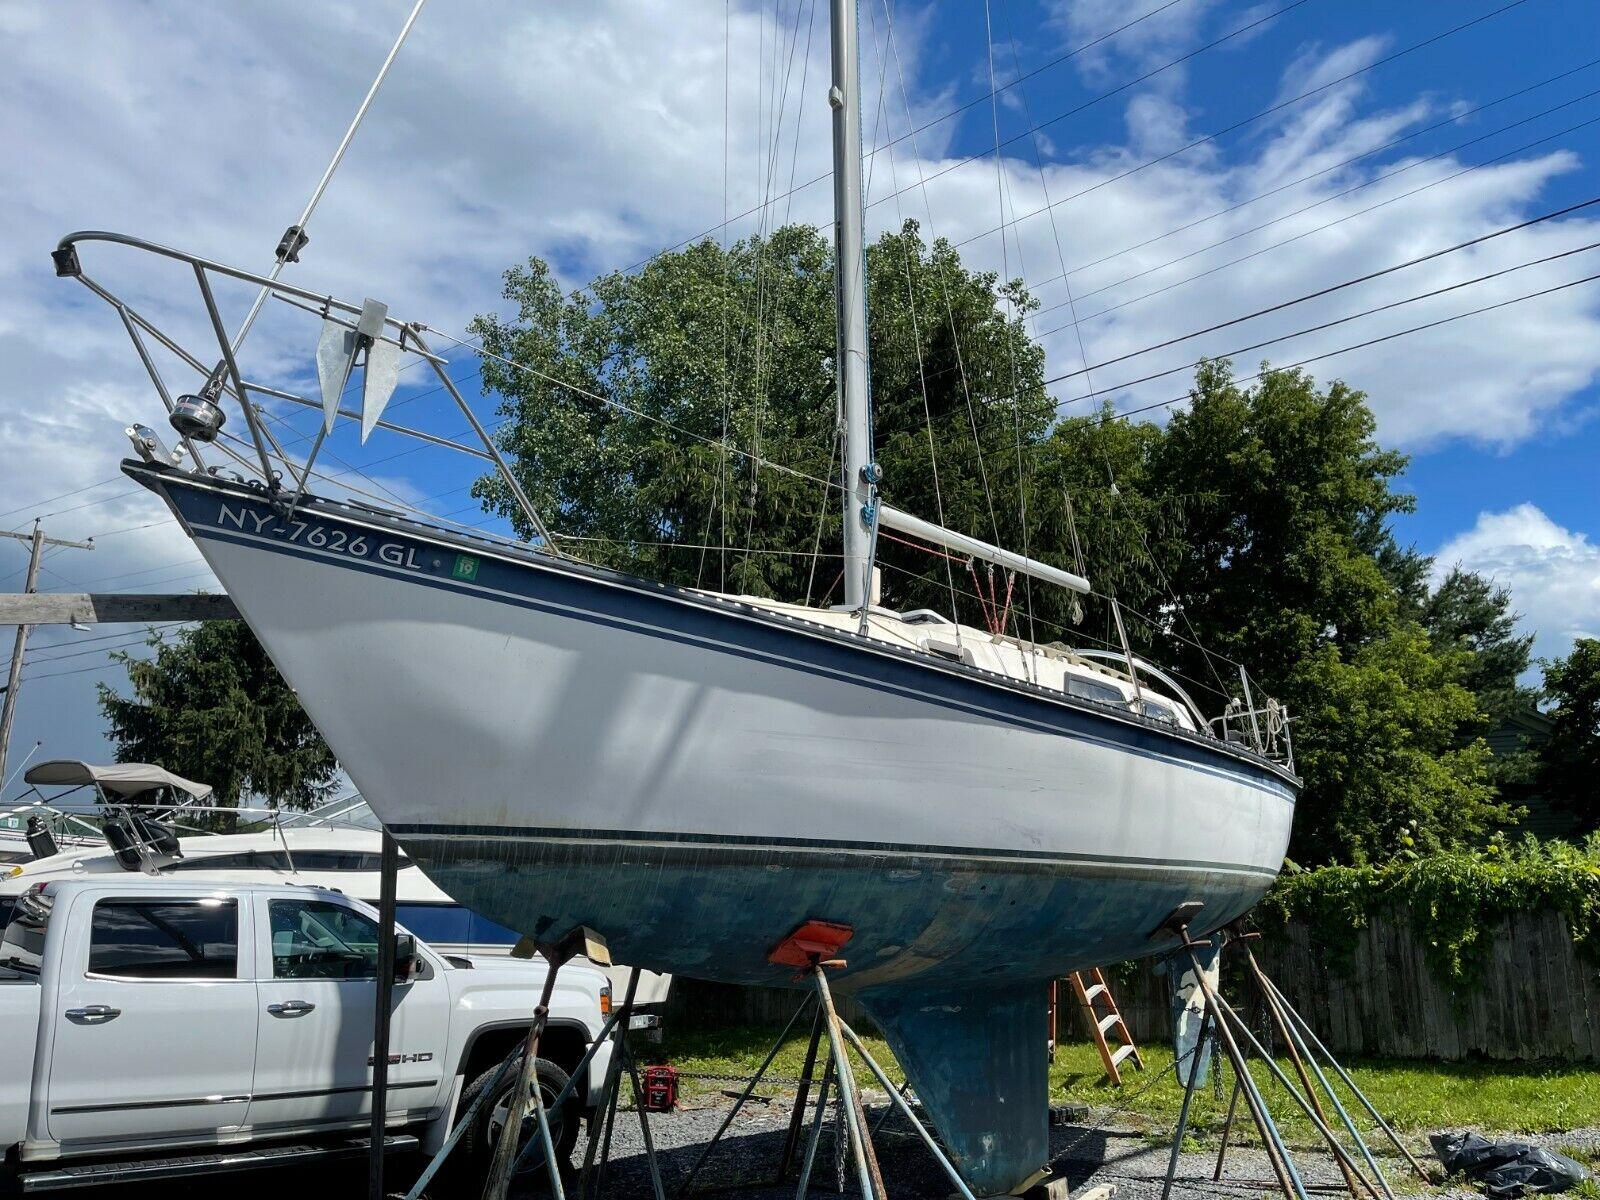 1983 Newport 28' Sailboat - New York